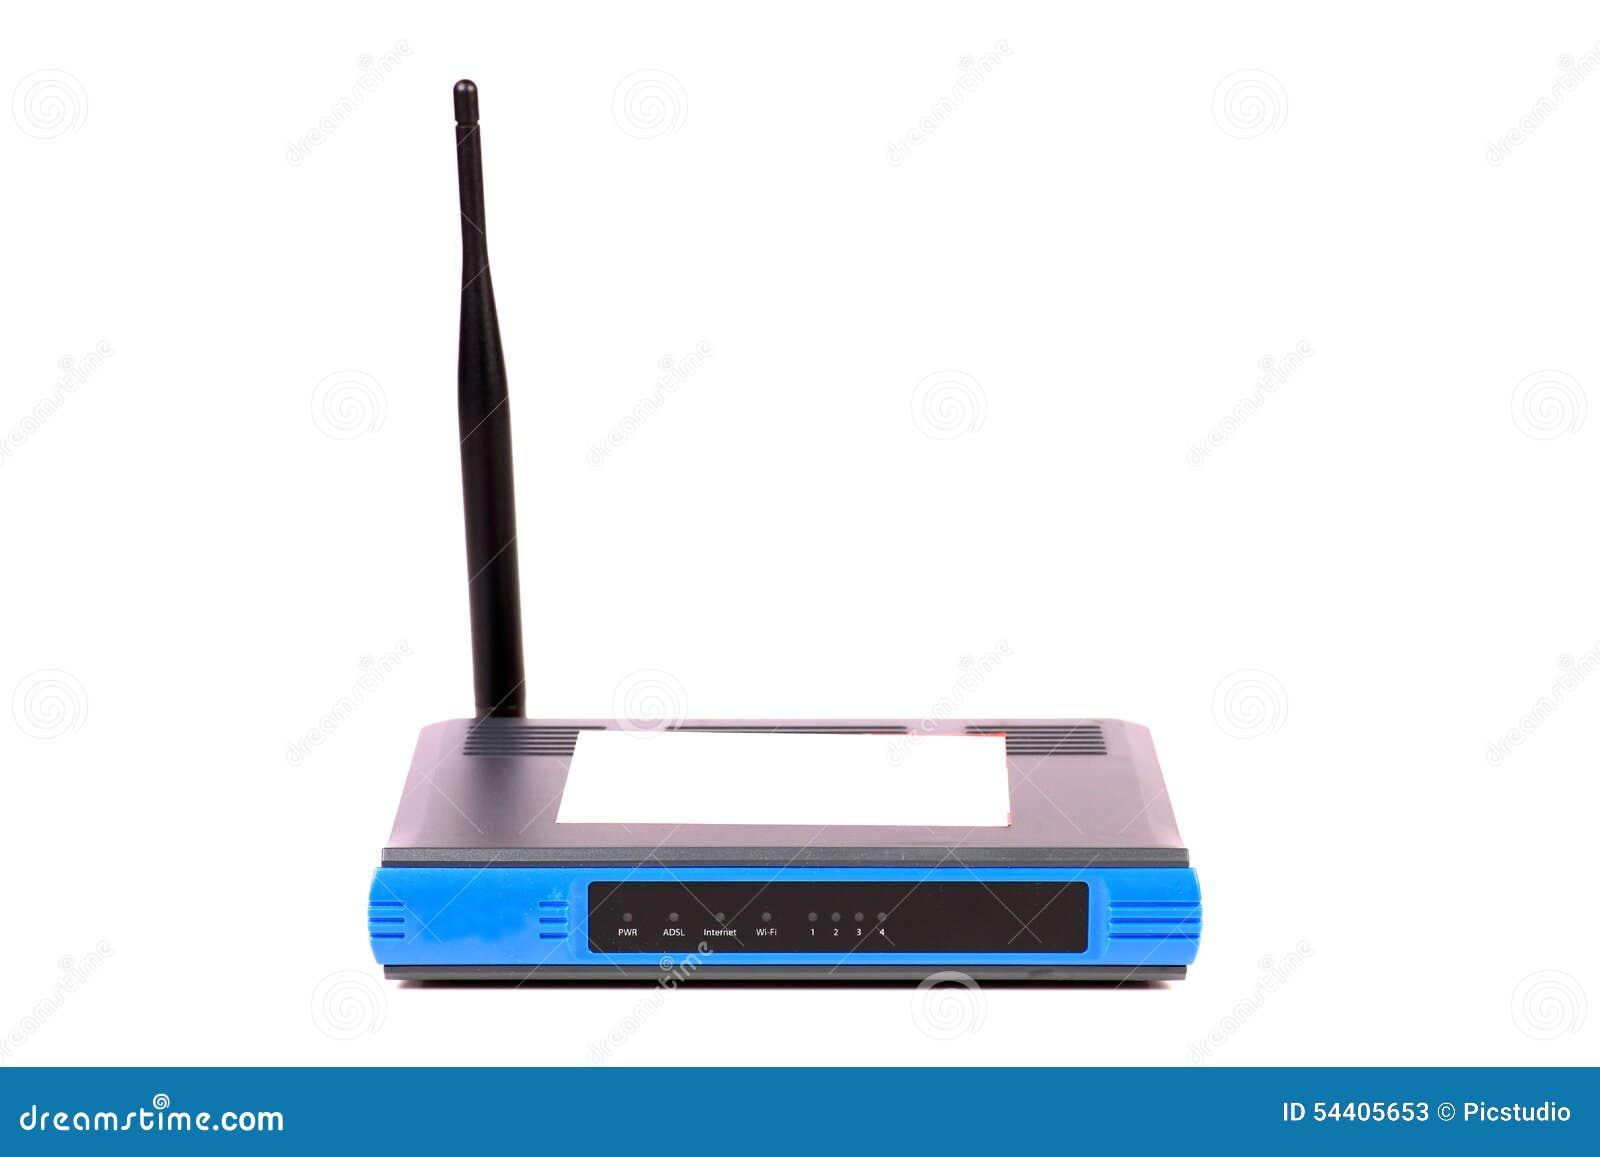 Internetowy modem